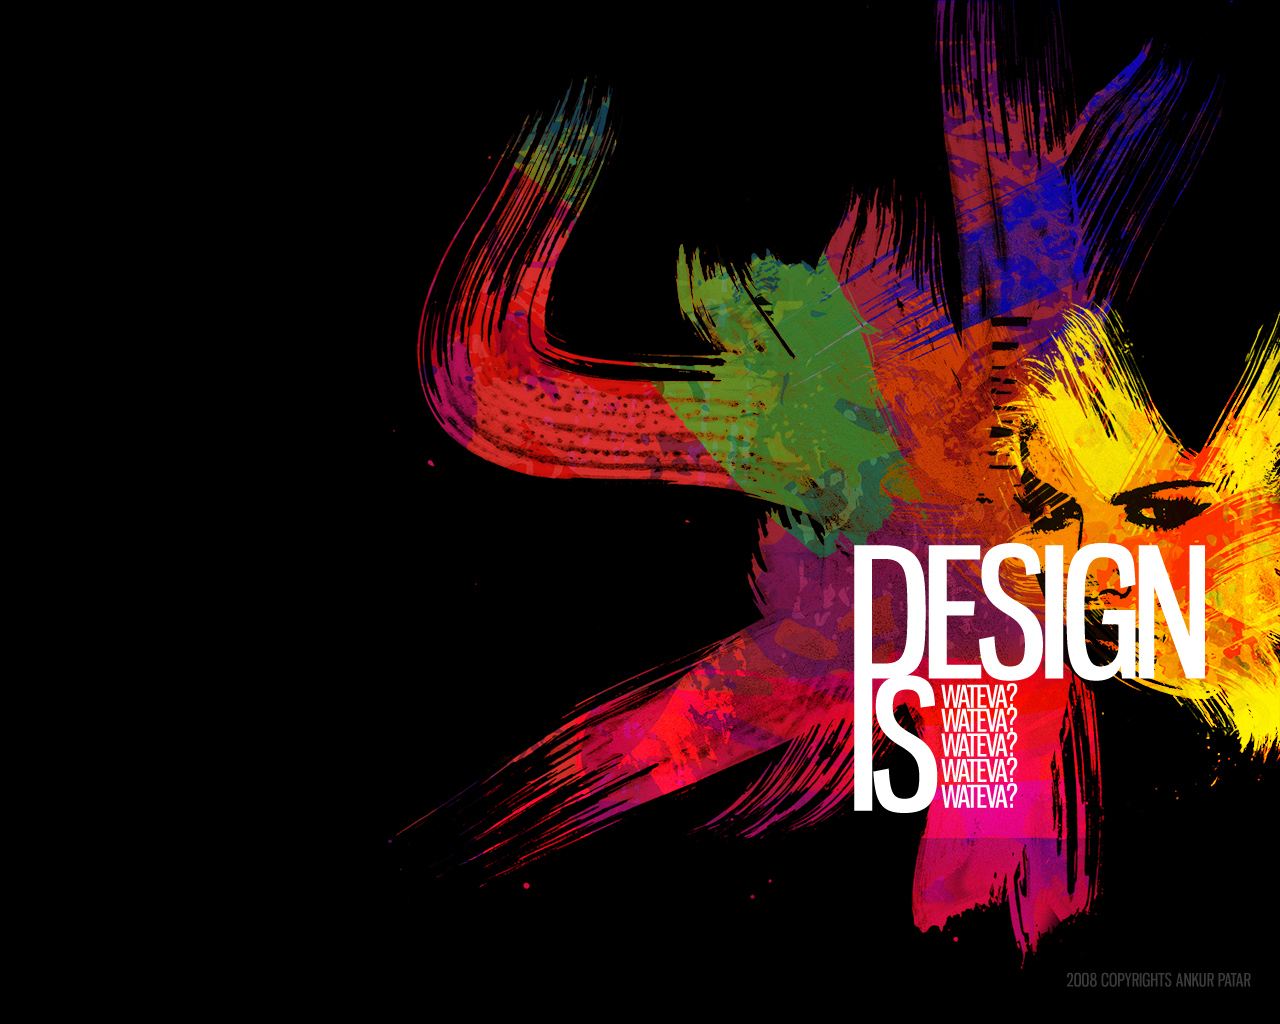 graphic designer backgrounds - hola.klonec.co